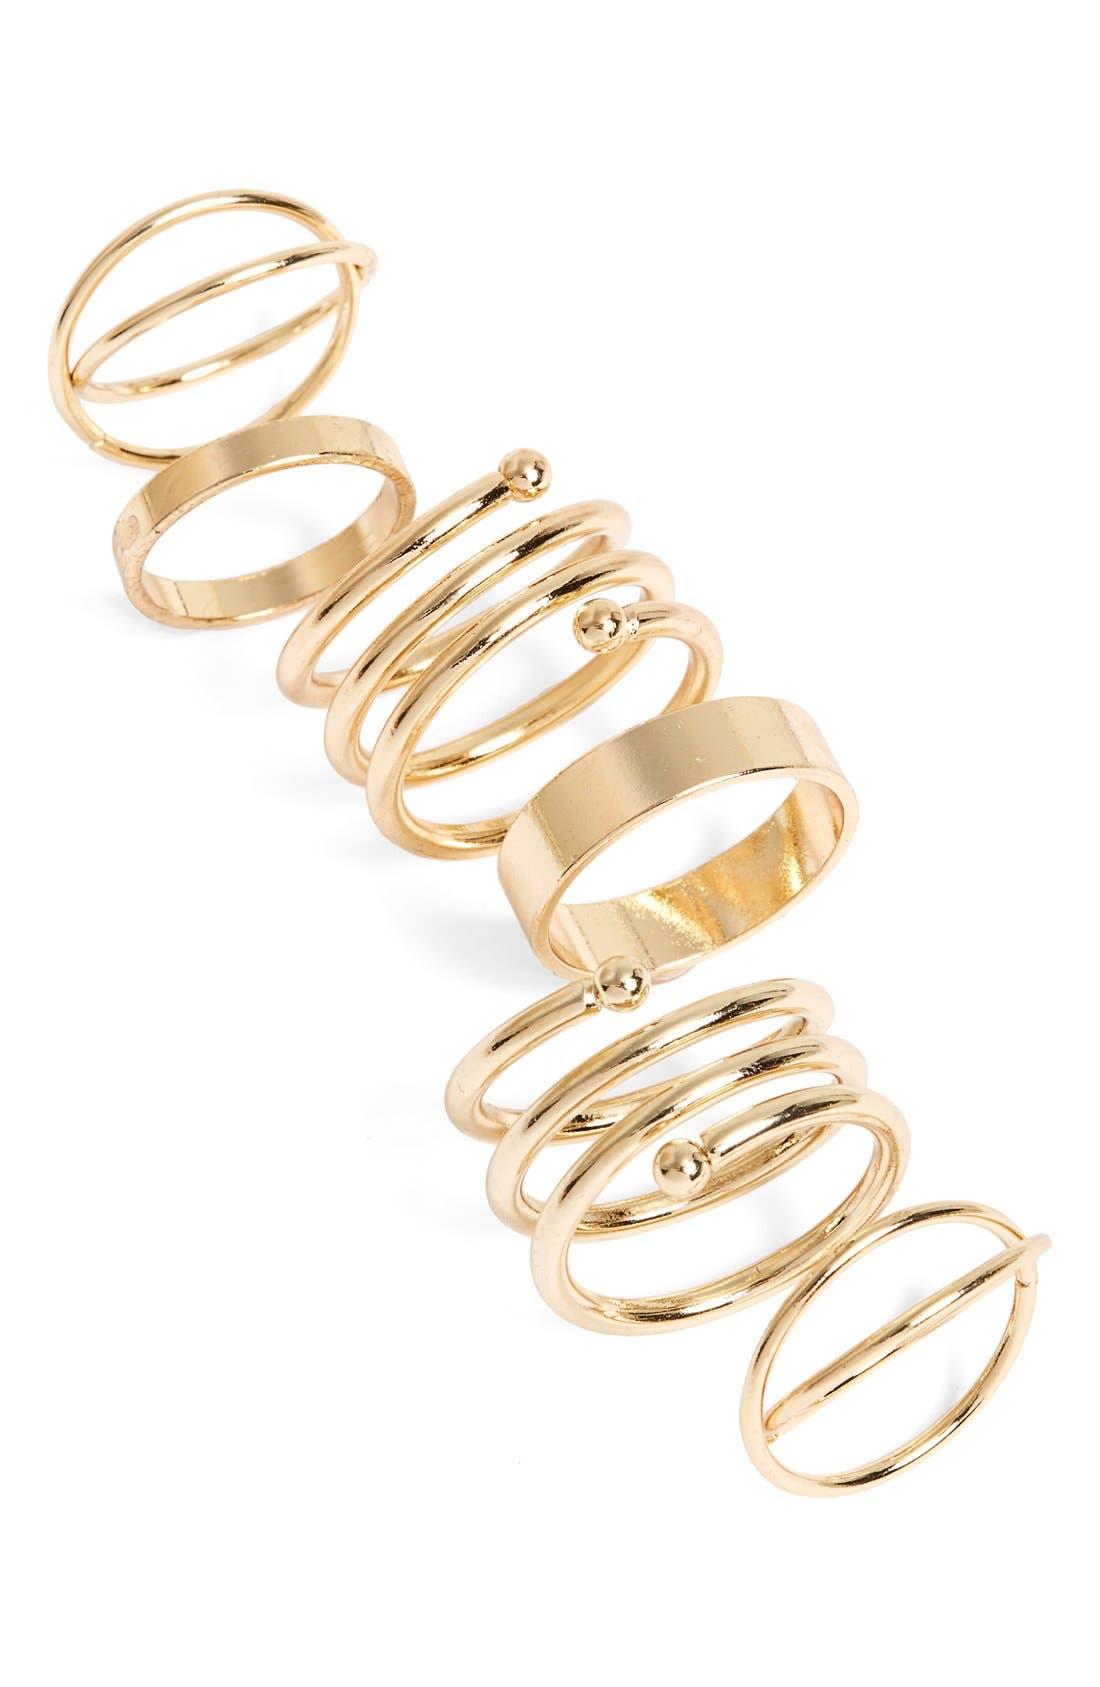 Alternate Image 1 Selected - BP. Rings (Set of 6)